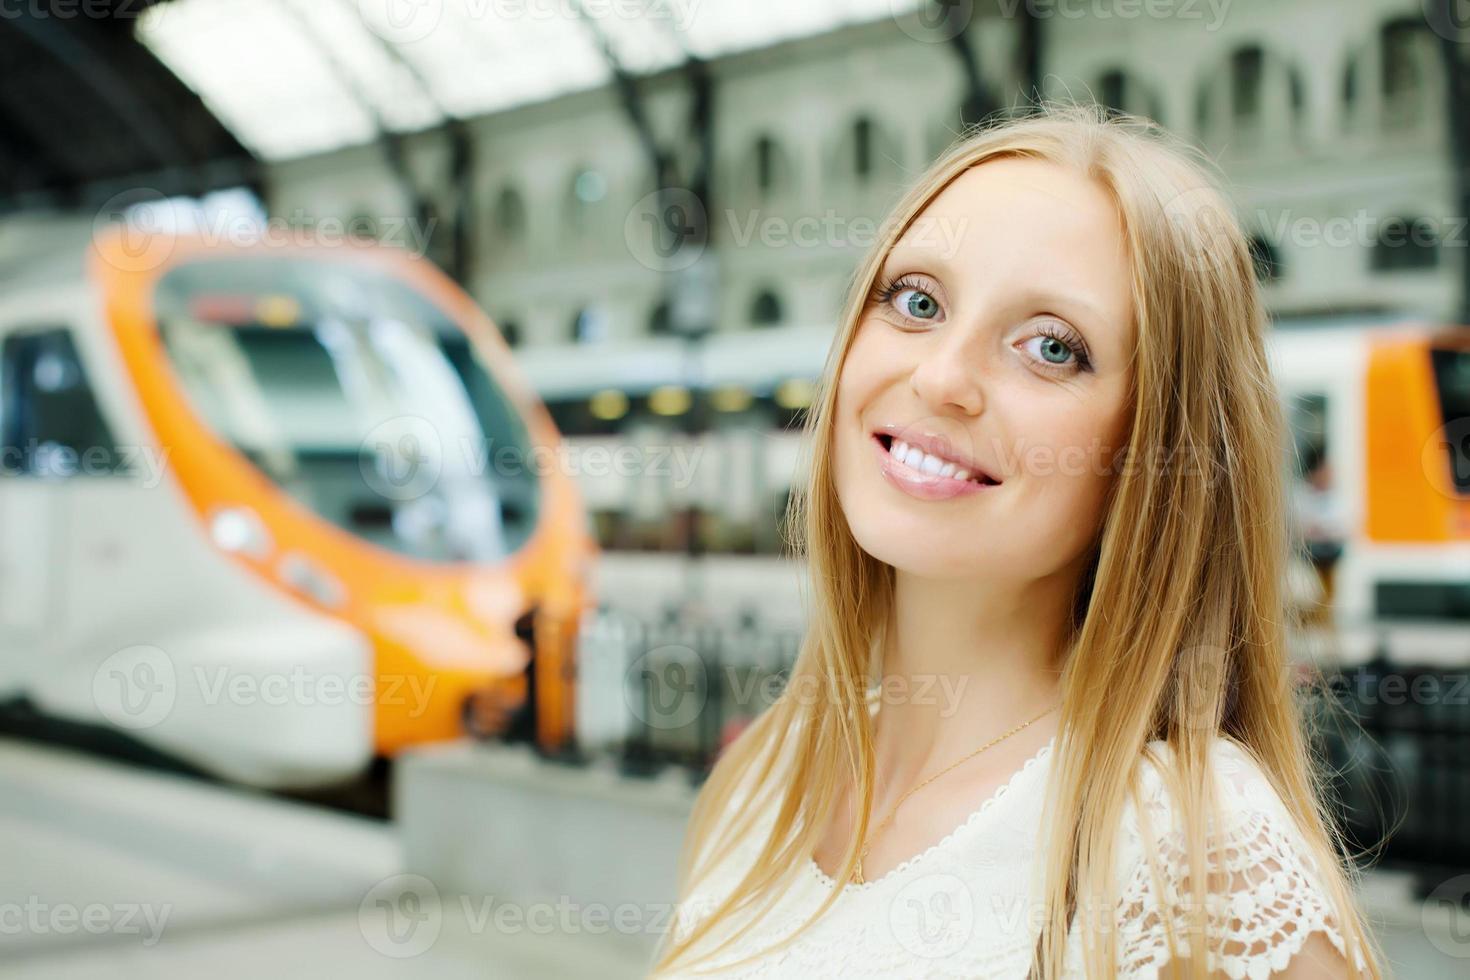 vrouw wachten trein op station foto